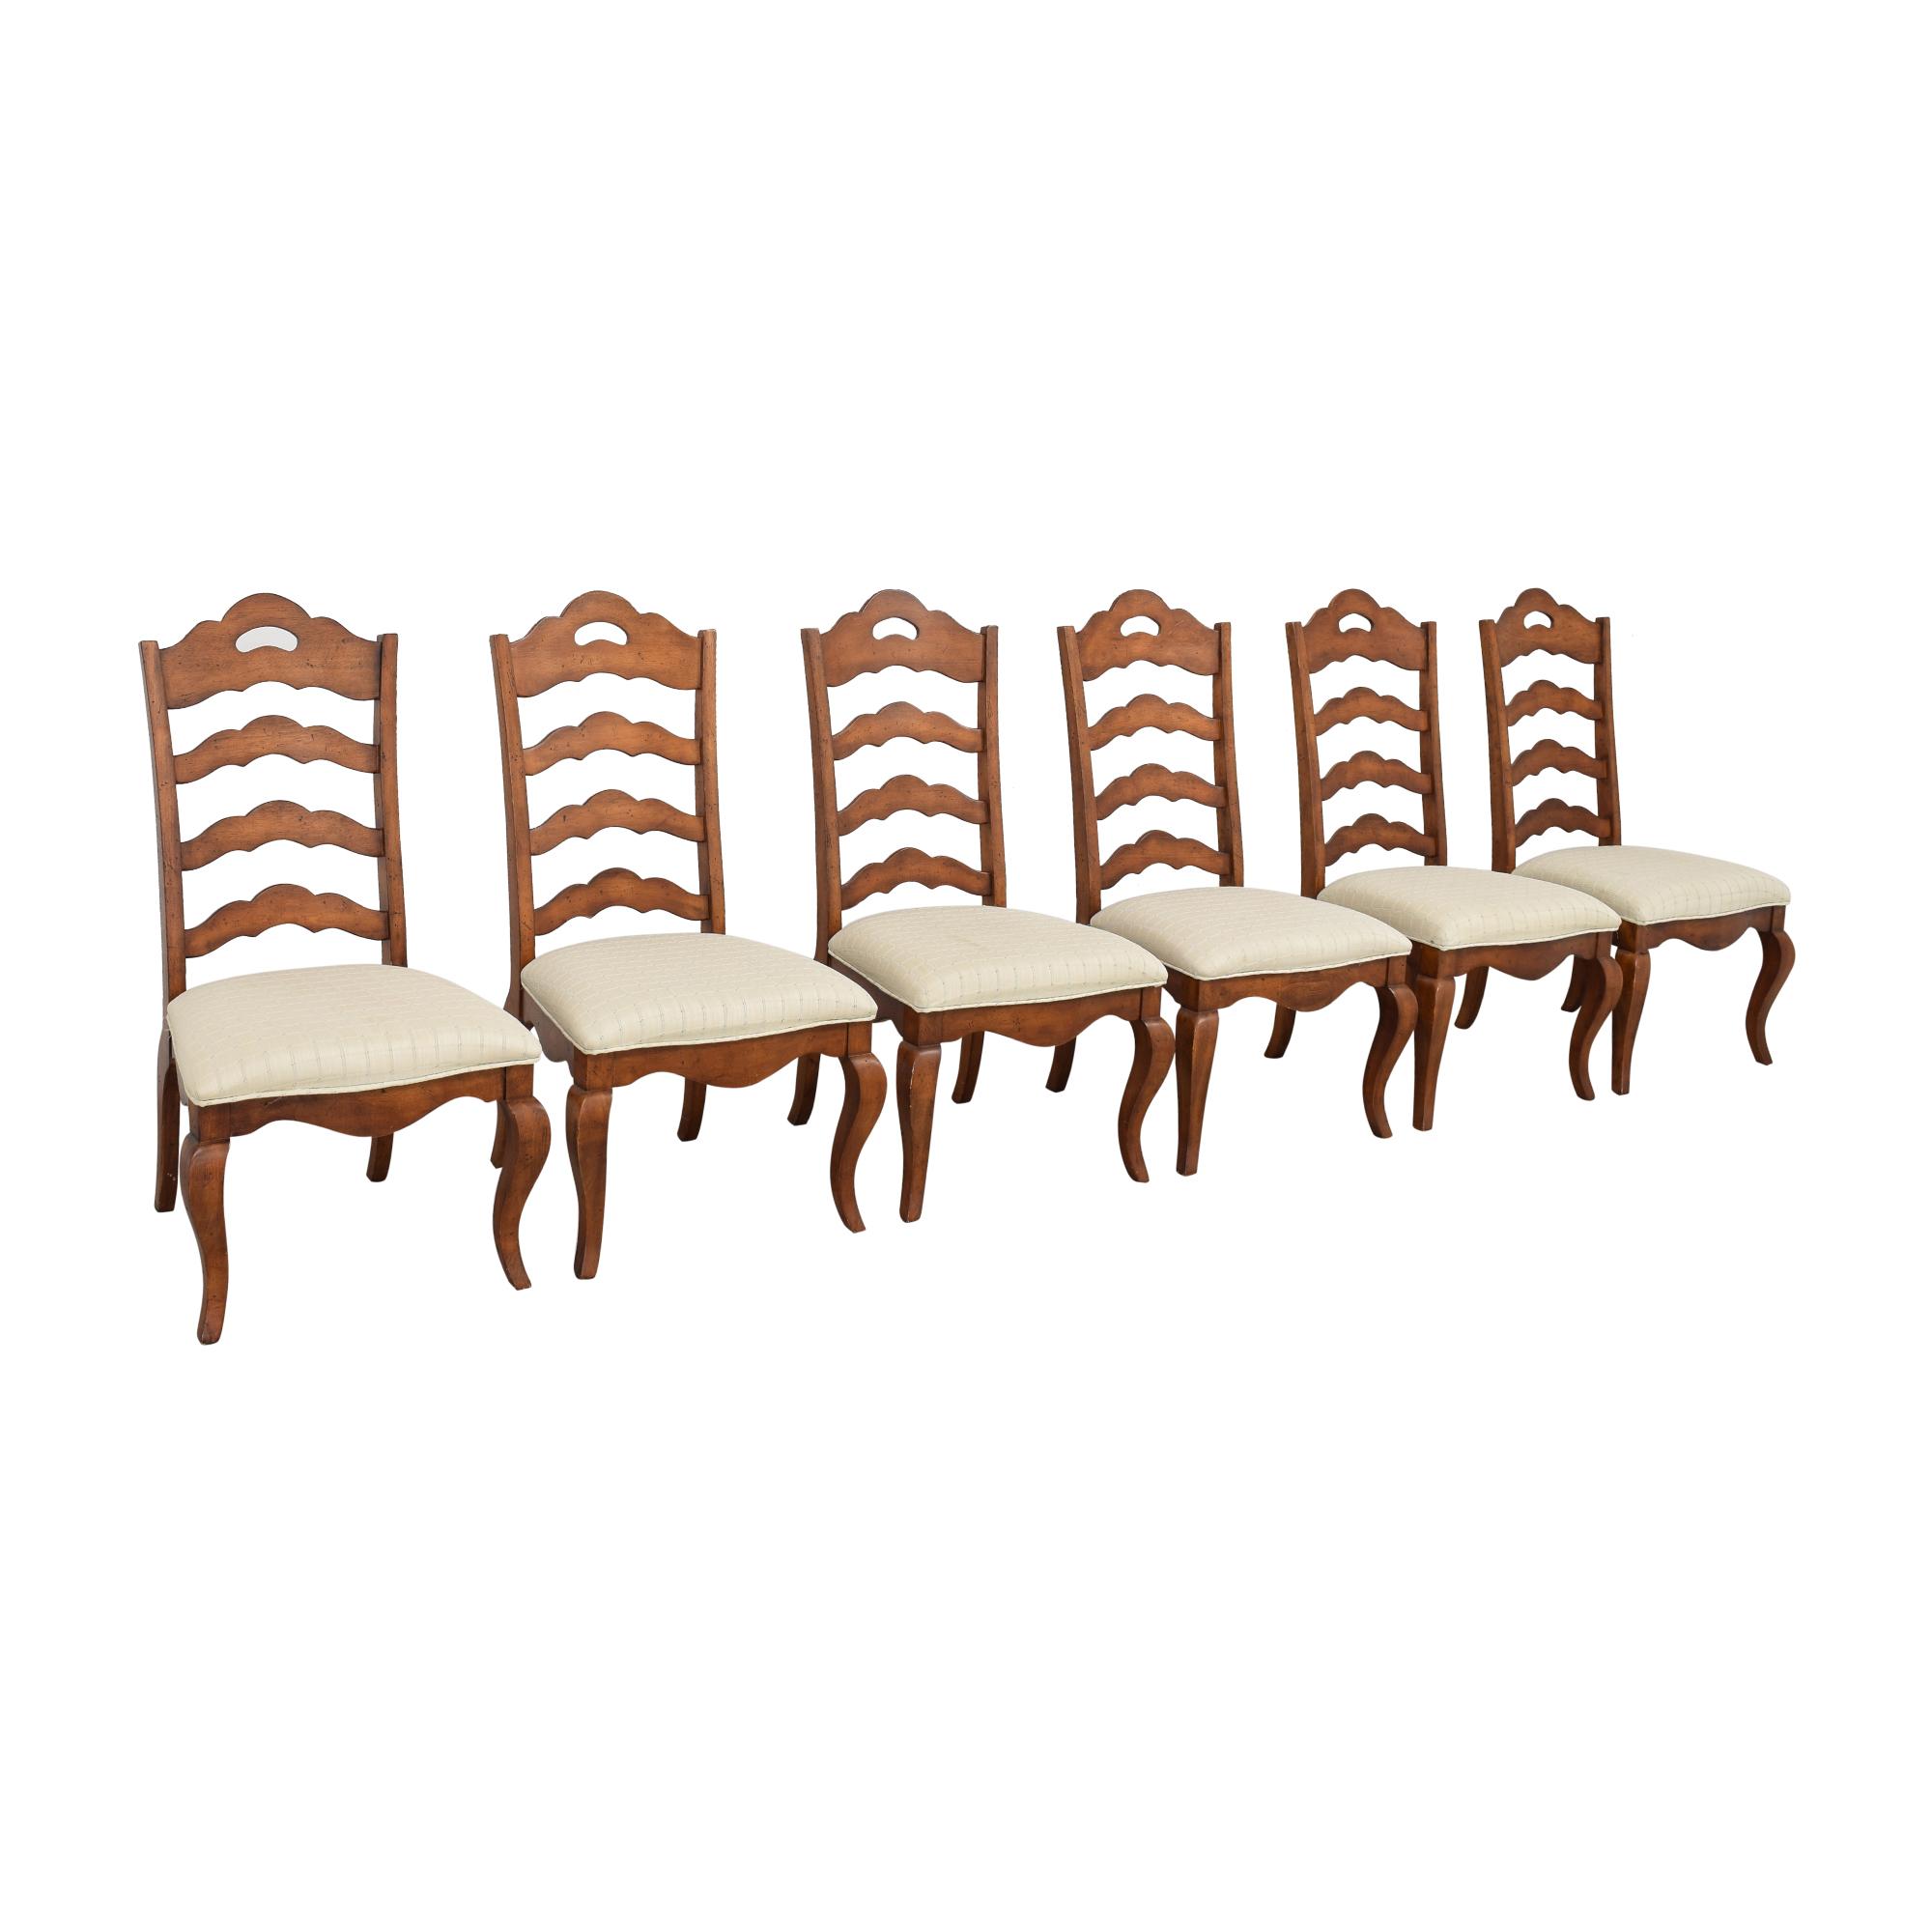 buy Universal Furniture Ladder Back Dining Chairs Universal Furniture